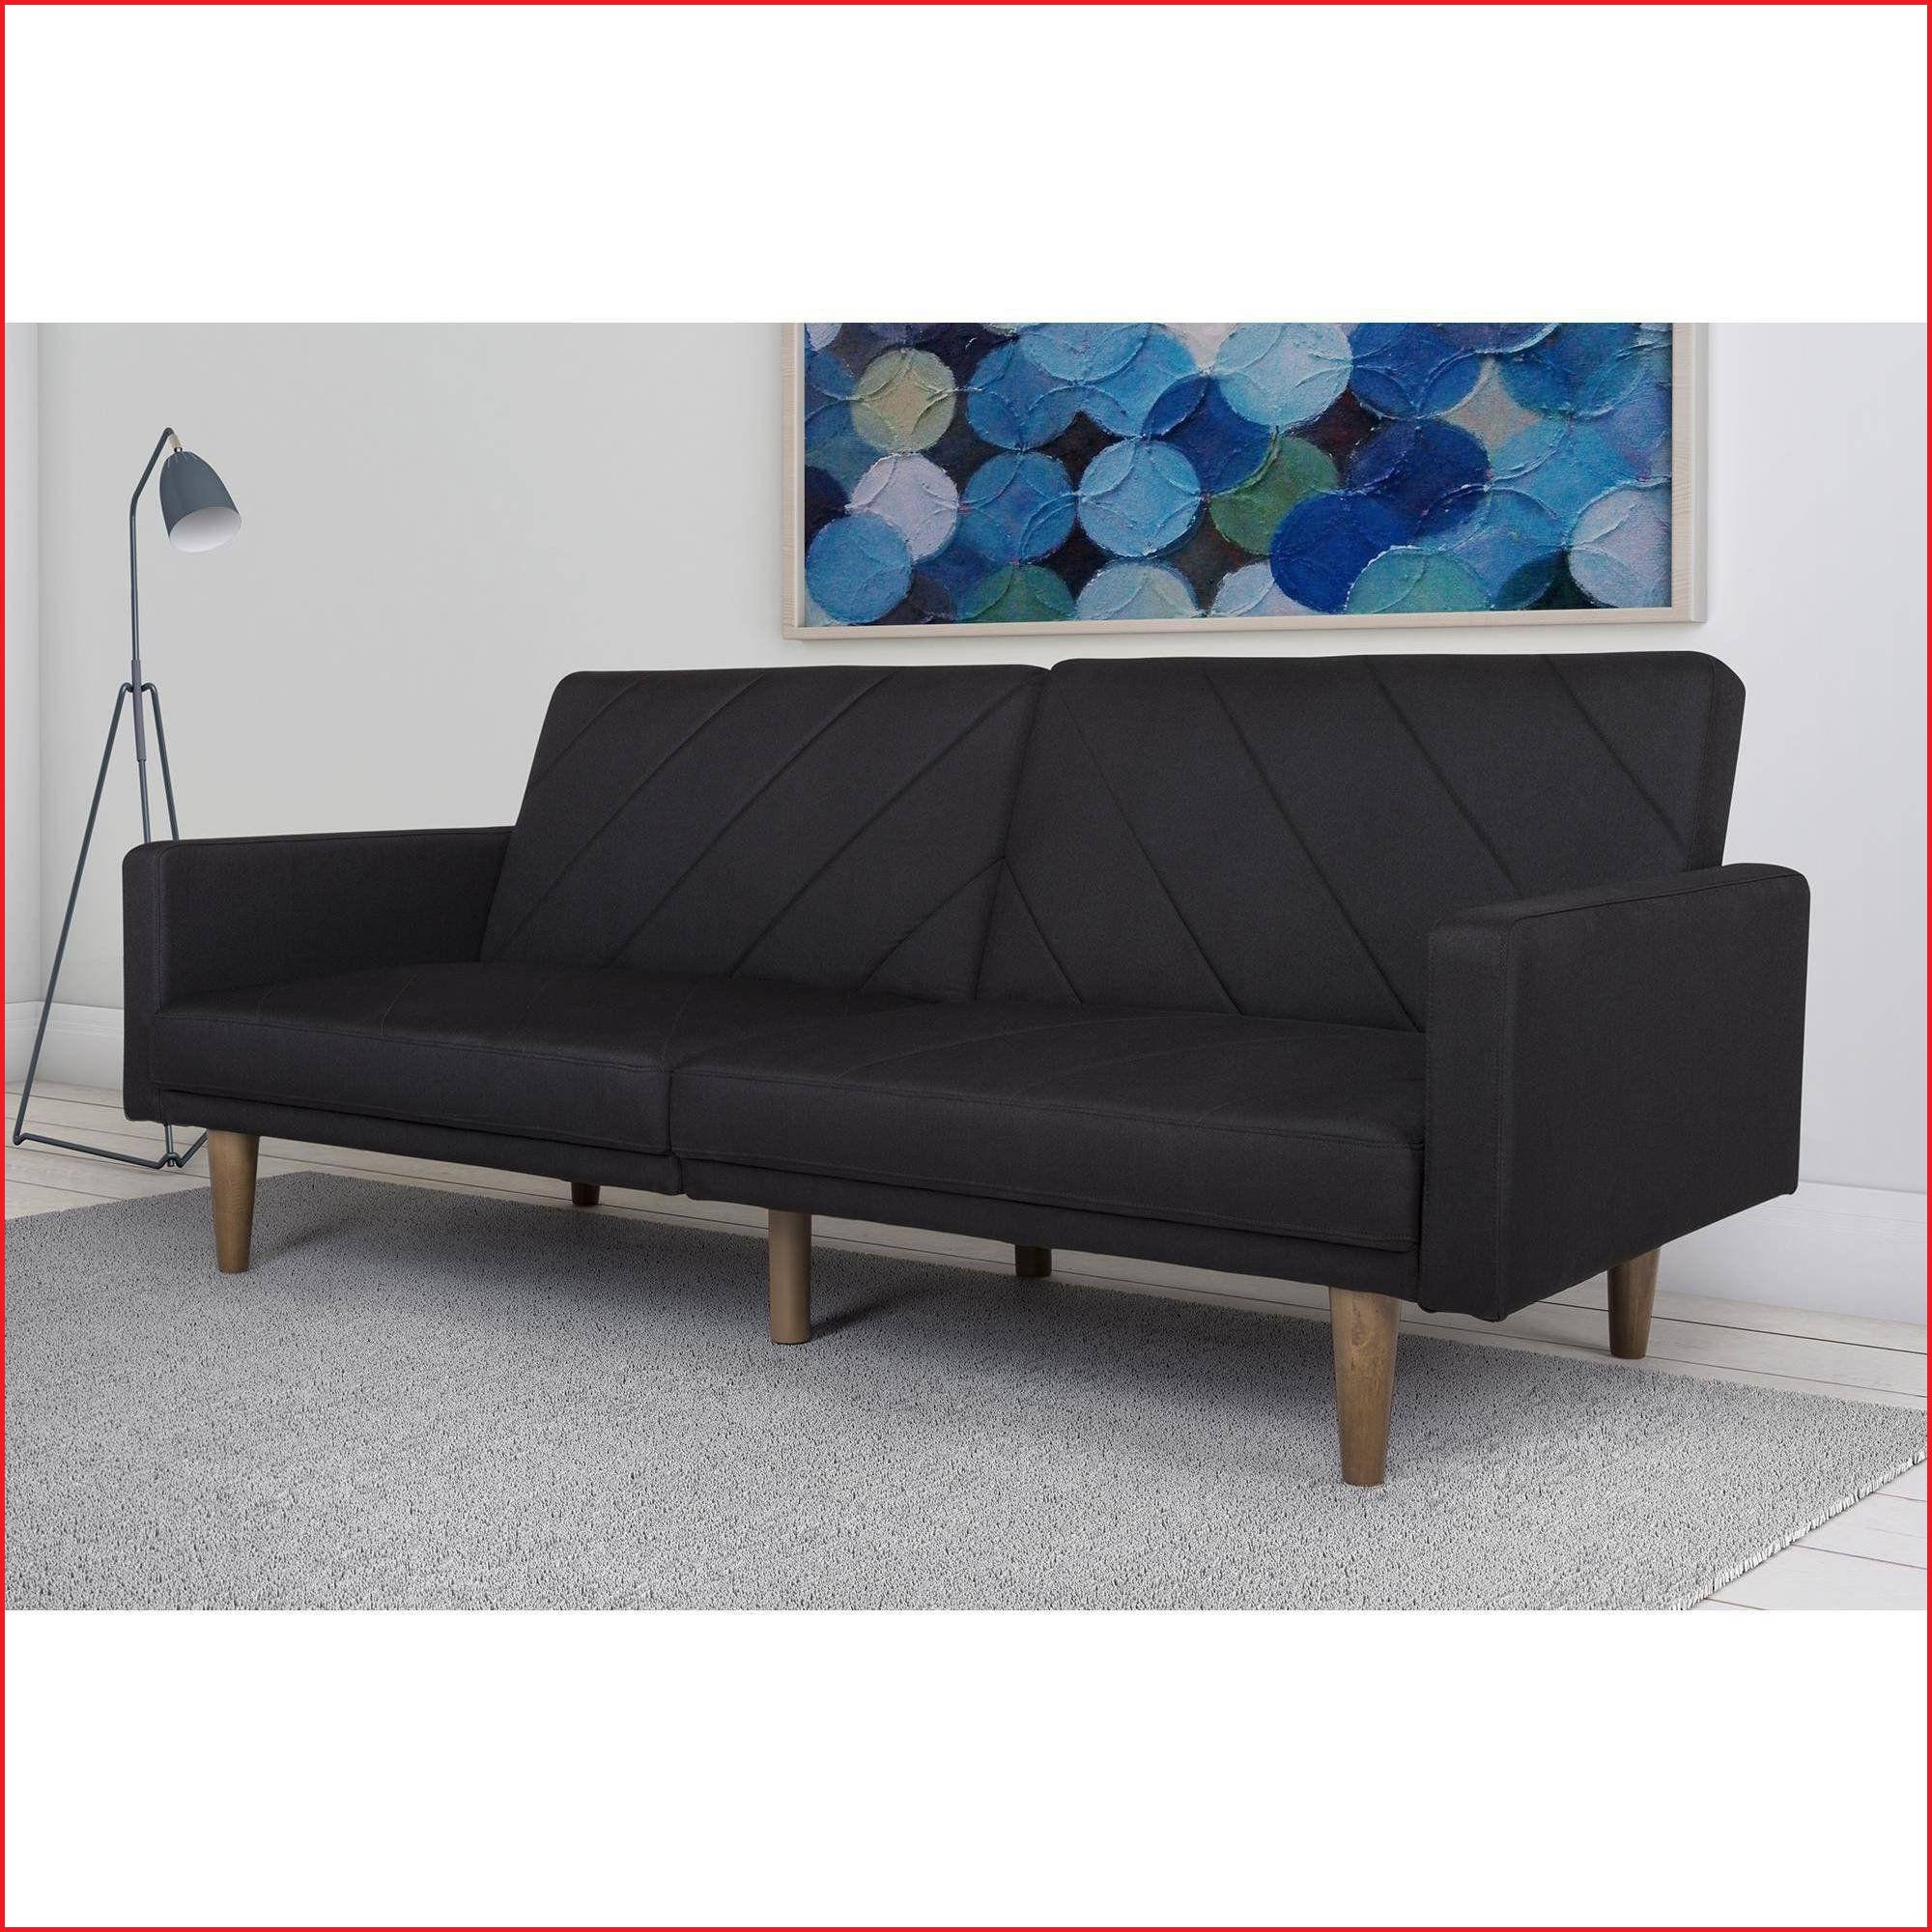 Sofa Cama Merkamueble Etdg sofa Cama Merkamueble sofas Cama Best Best sofa Cama Design